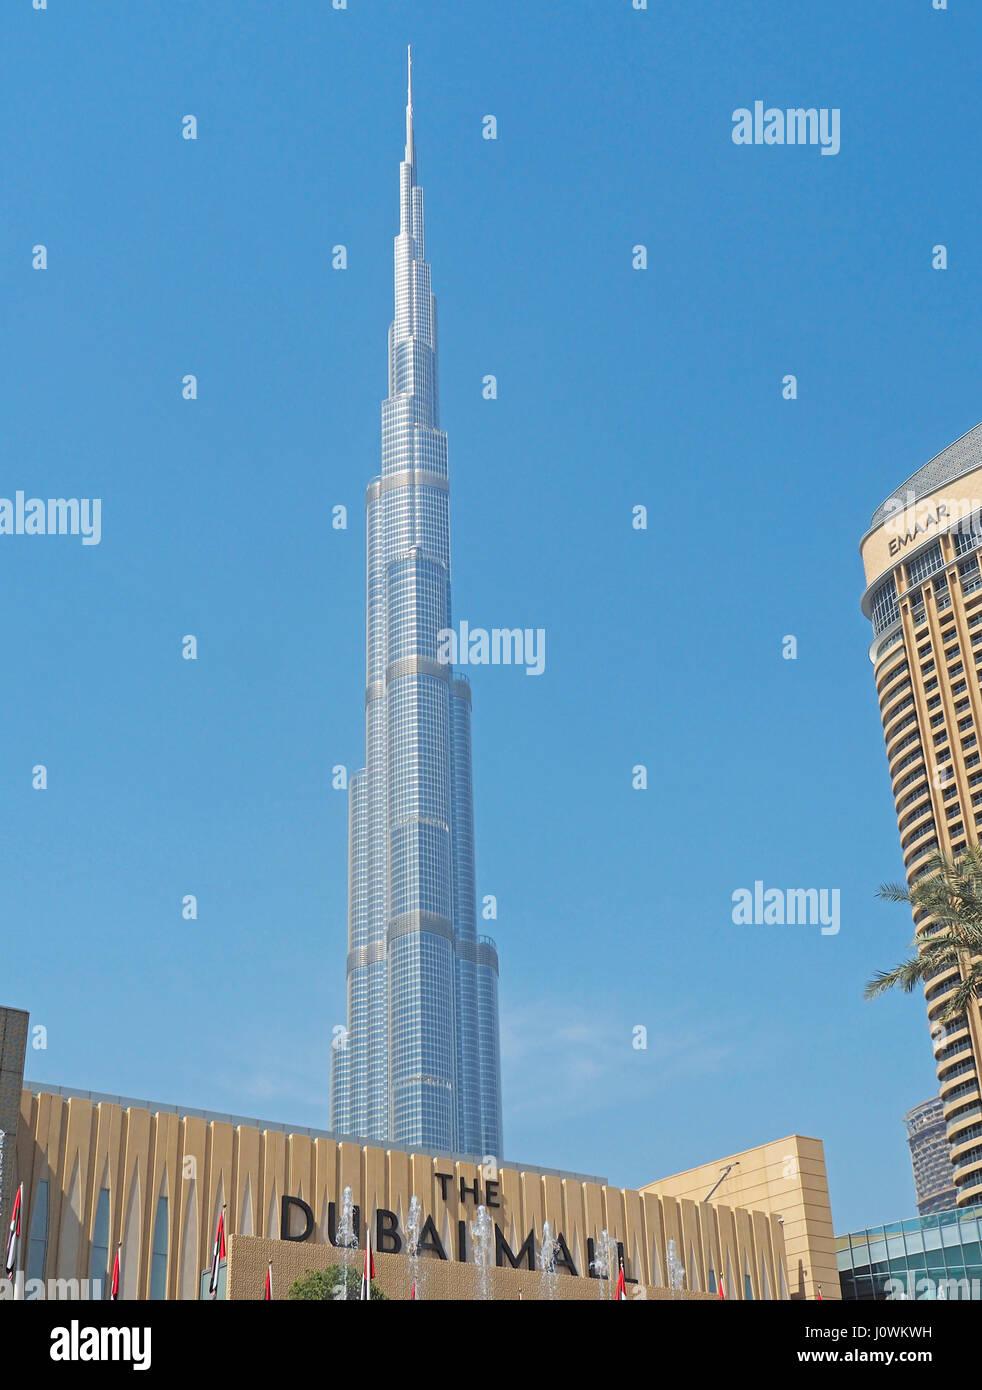 Burj Khalifa skyscraper, in Dubai, UAE. - Stock Image